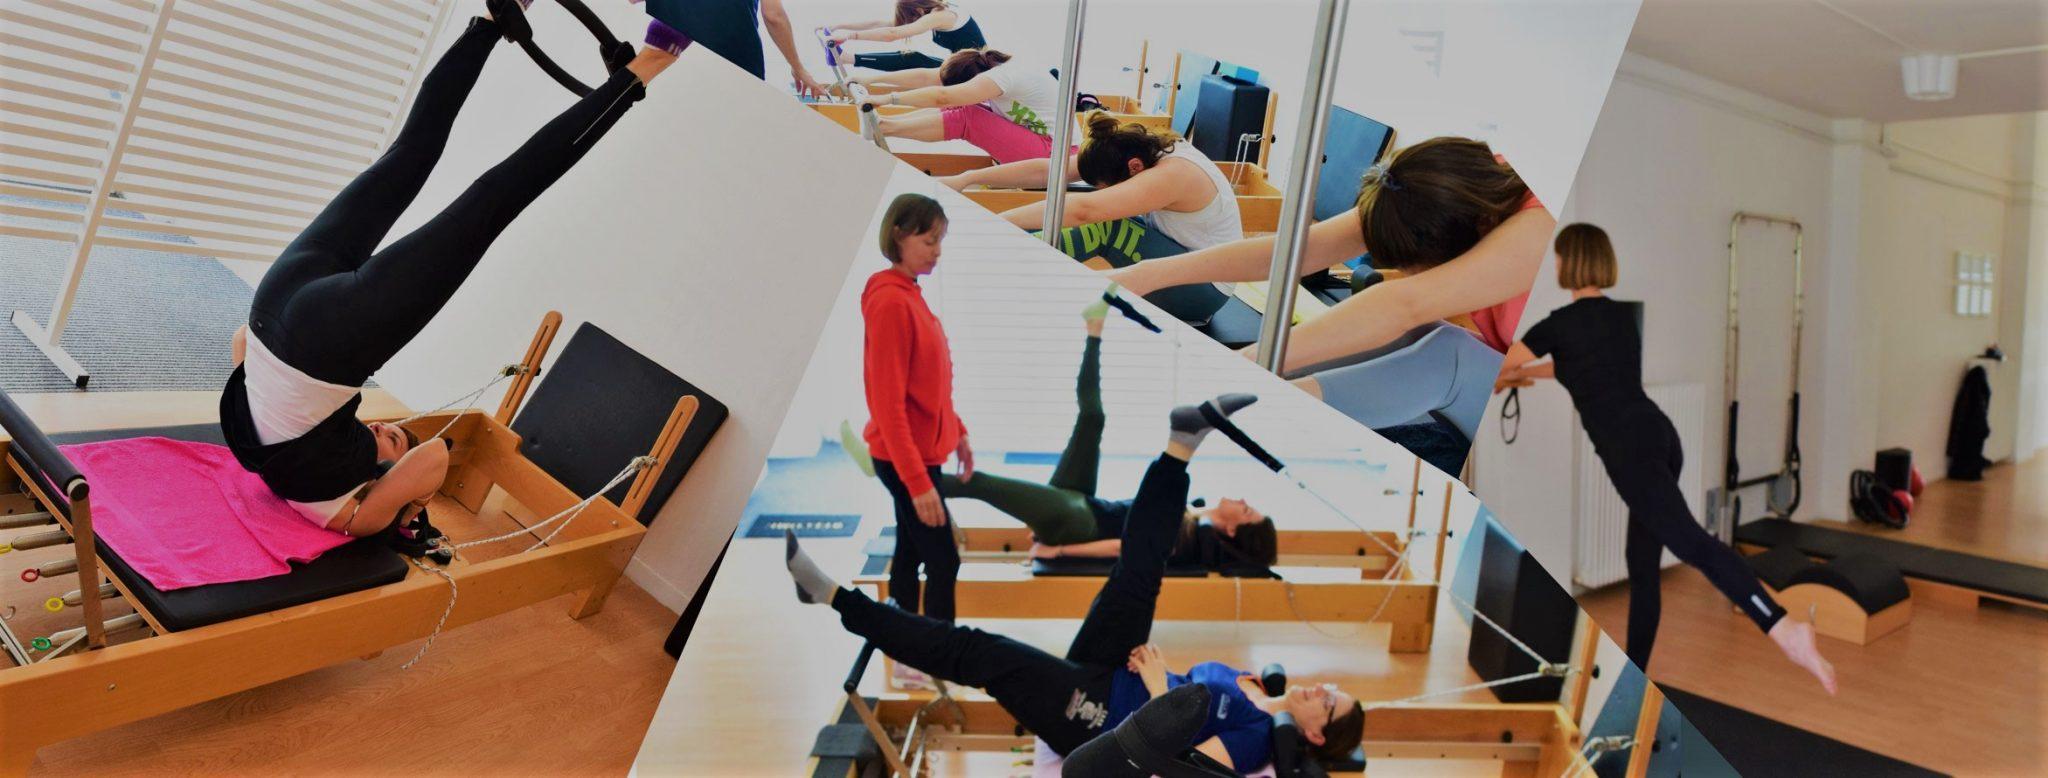 Pilates Μηχανήματα 4